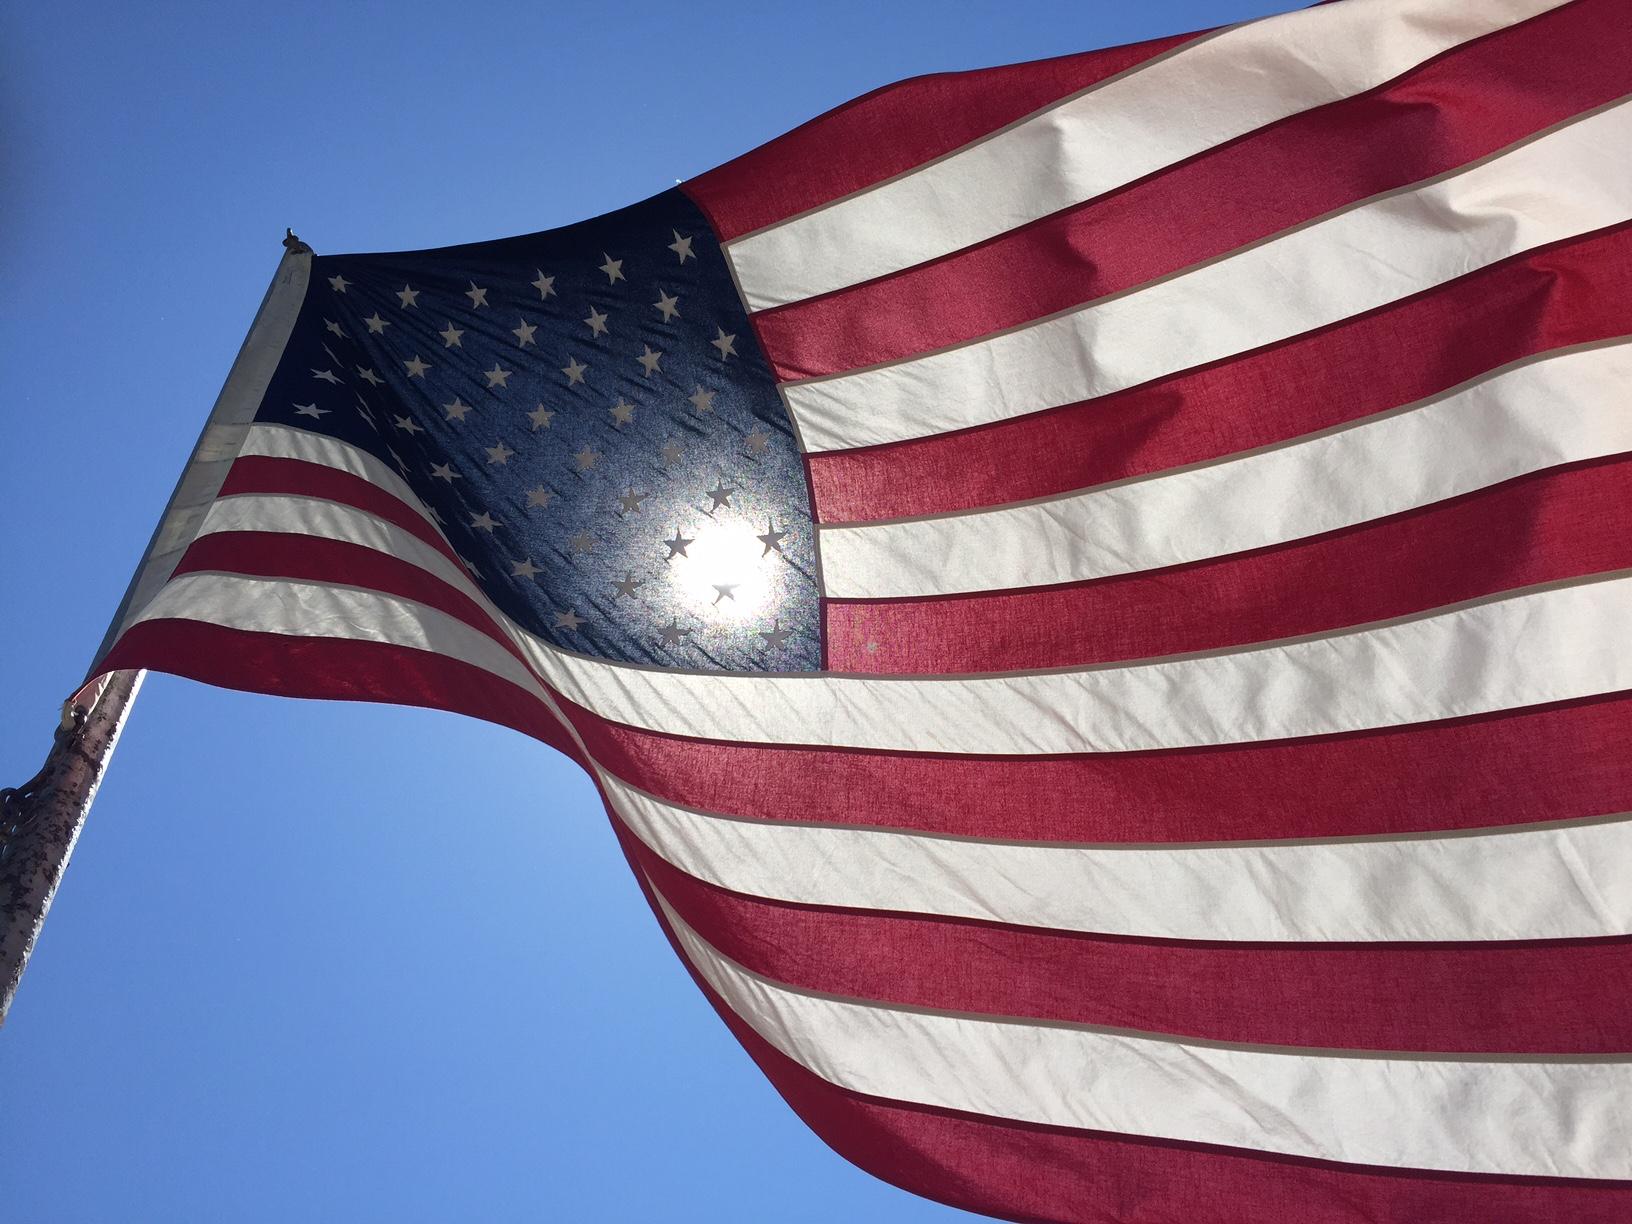 flag, USA, American, American Flag, Memorial Day_394598